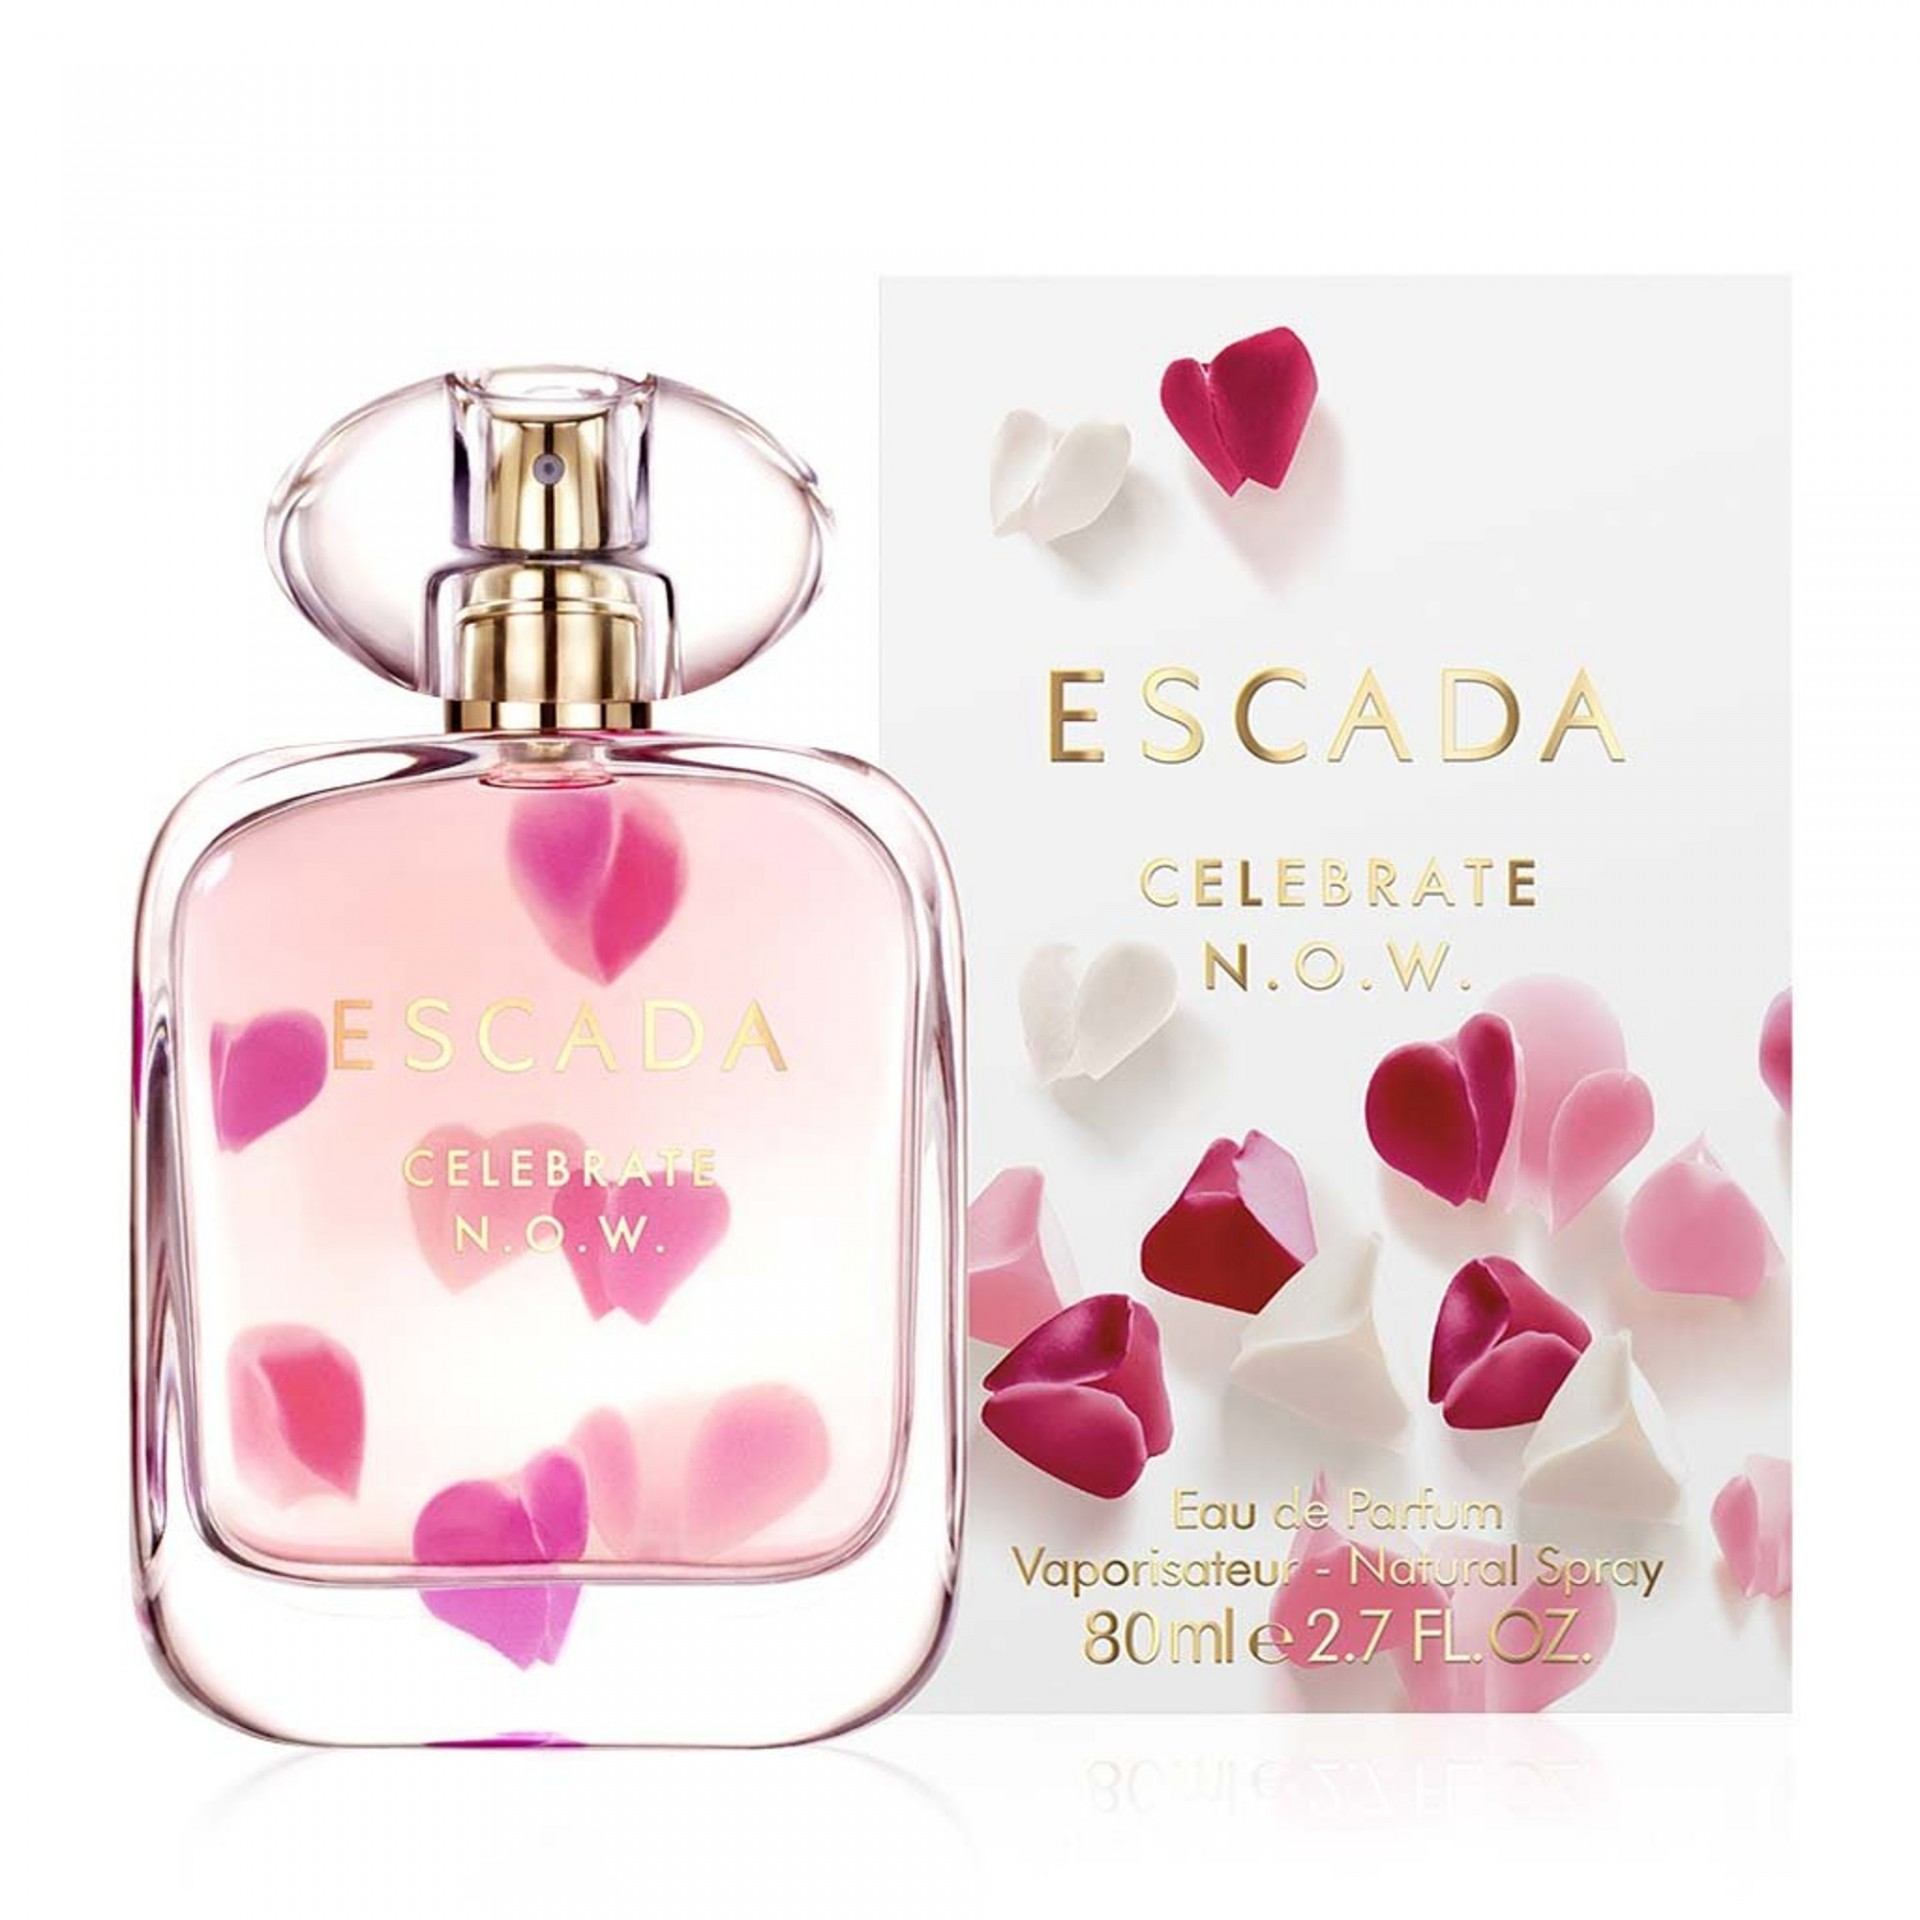 Escada - Celebrate N.O.W. - eau de parfum